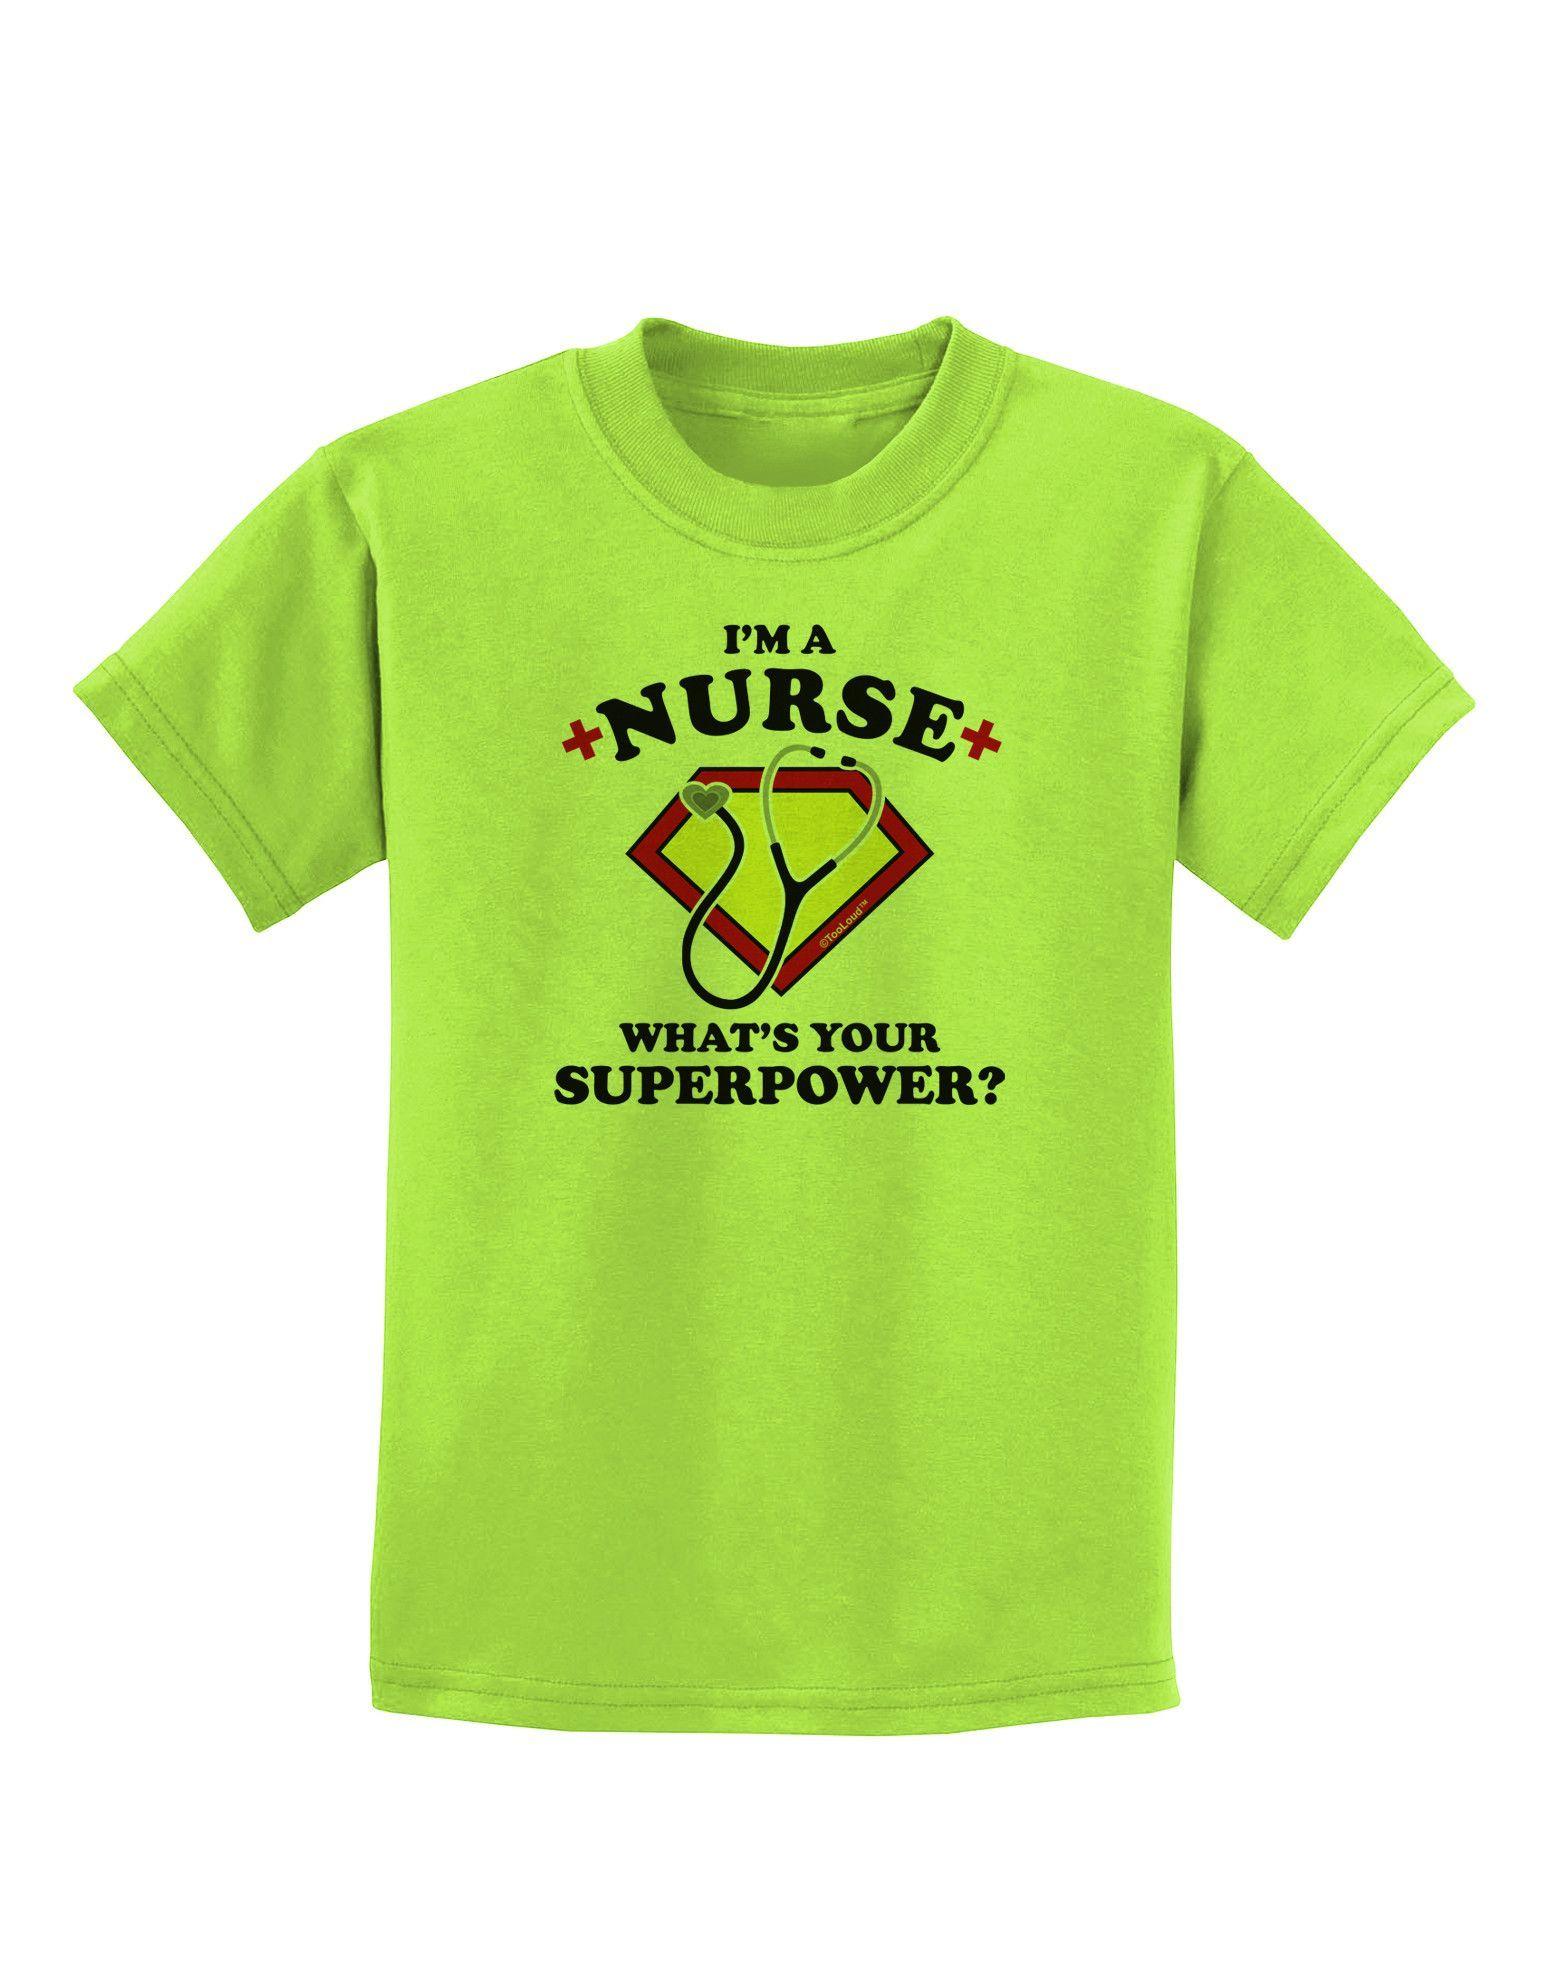 TooLoud Nurse - Superpower Childrens T-Shirt